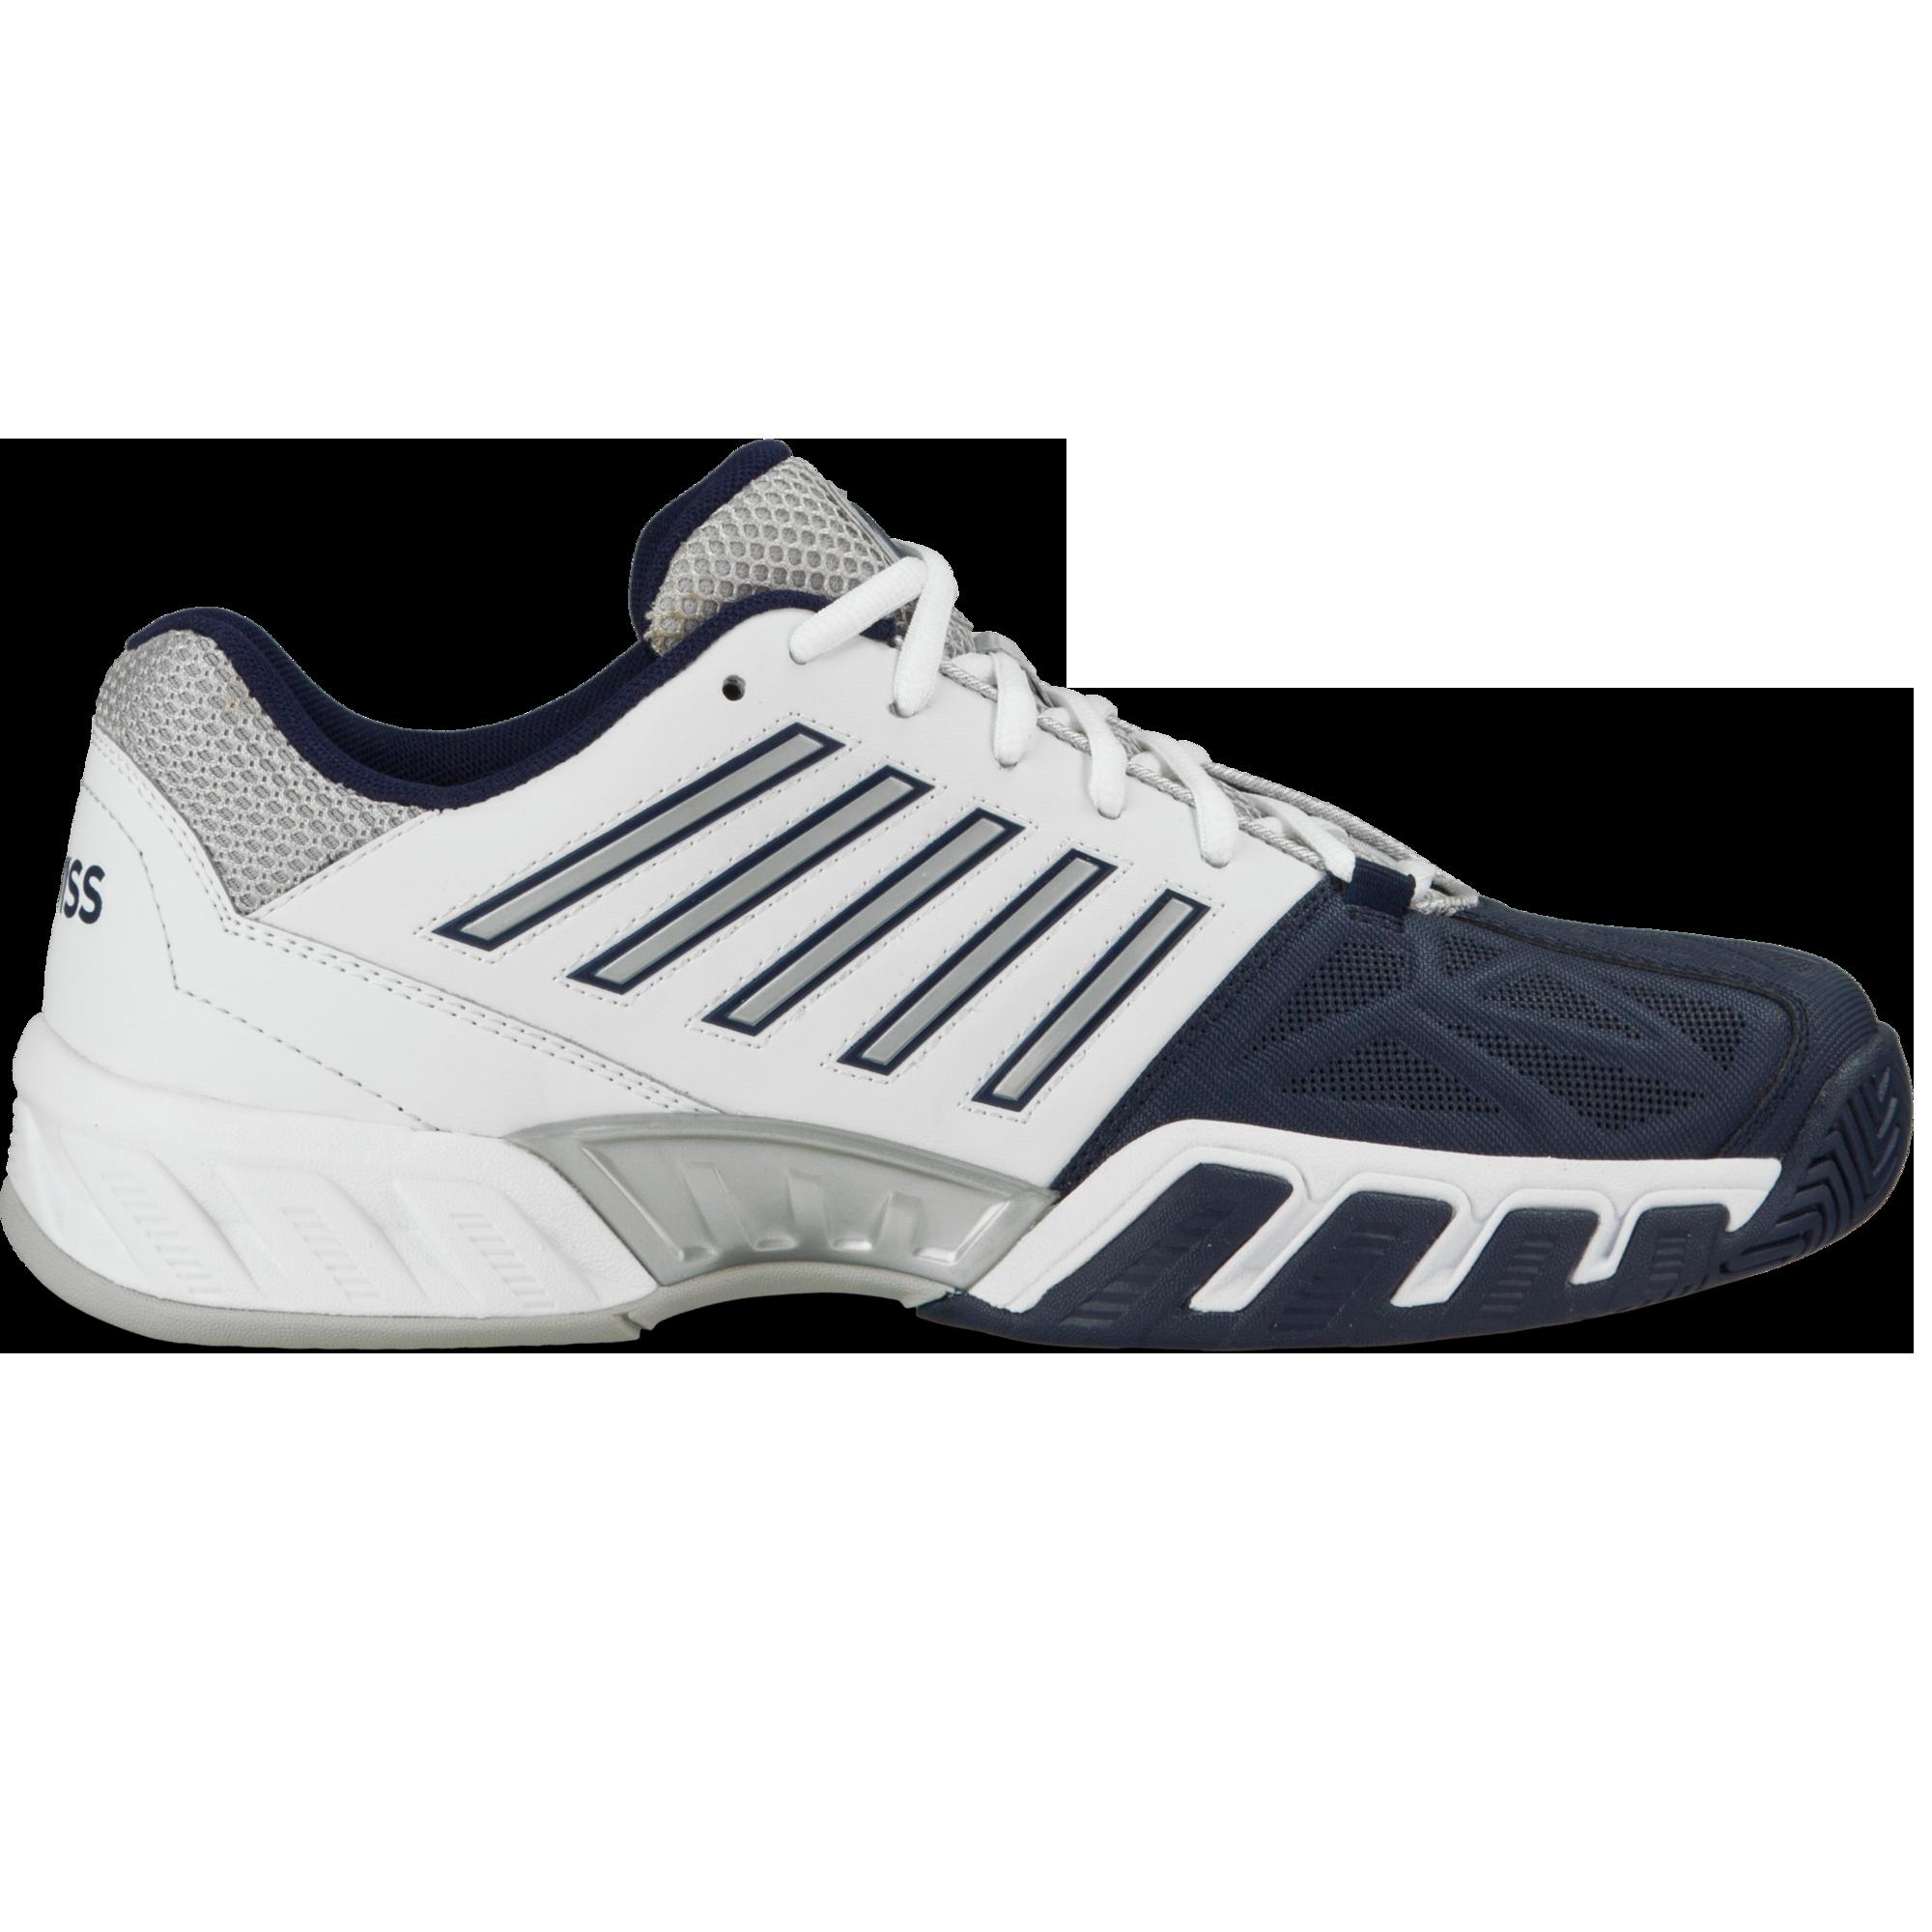 K Swiss Bigshot Light 3 Men S Tennis Shoe White Navy Pga Tour Superstore